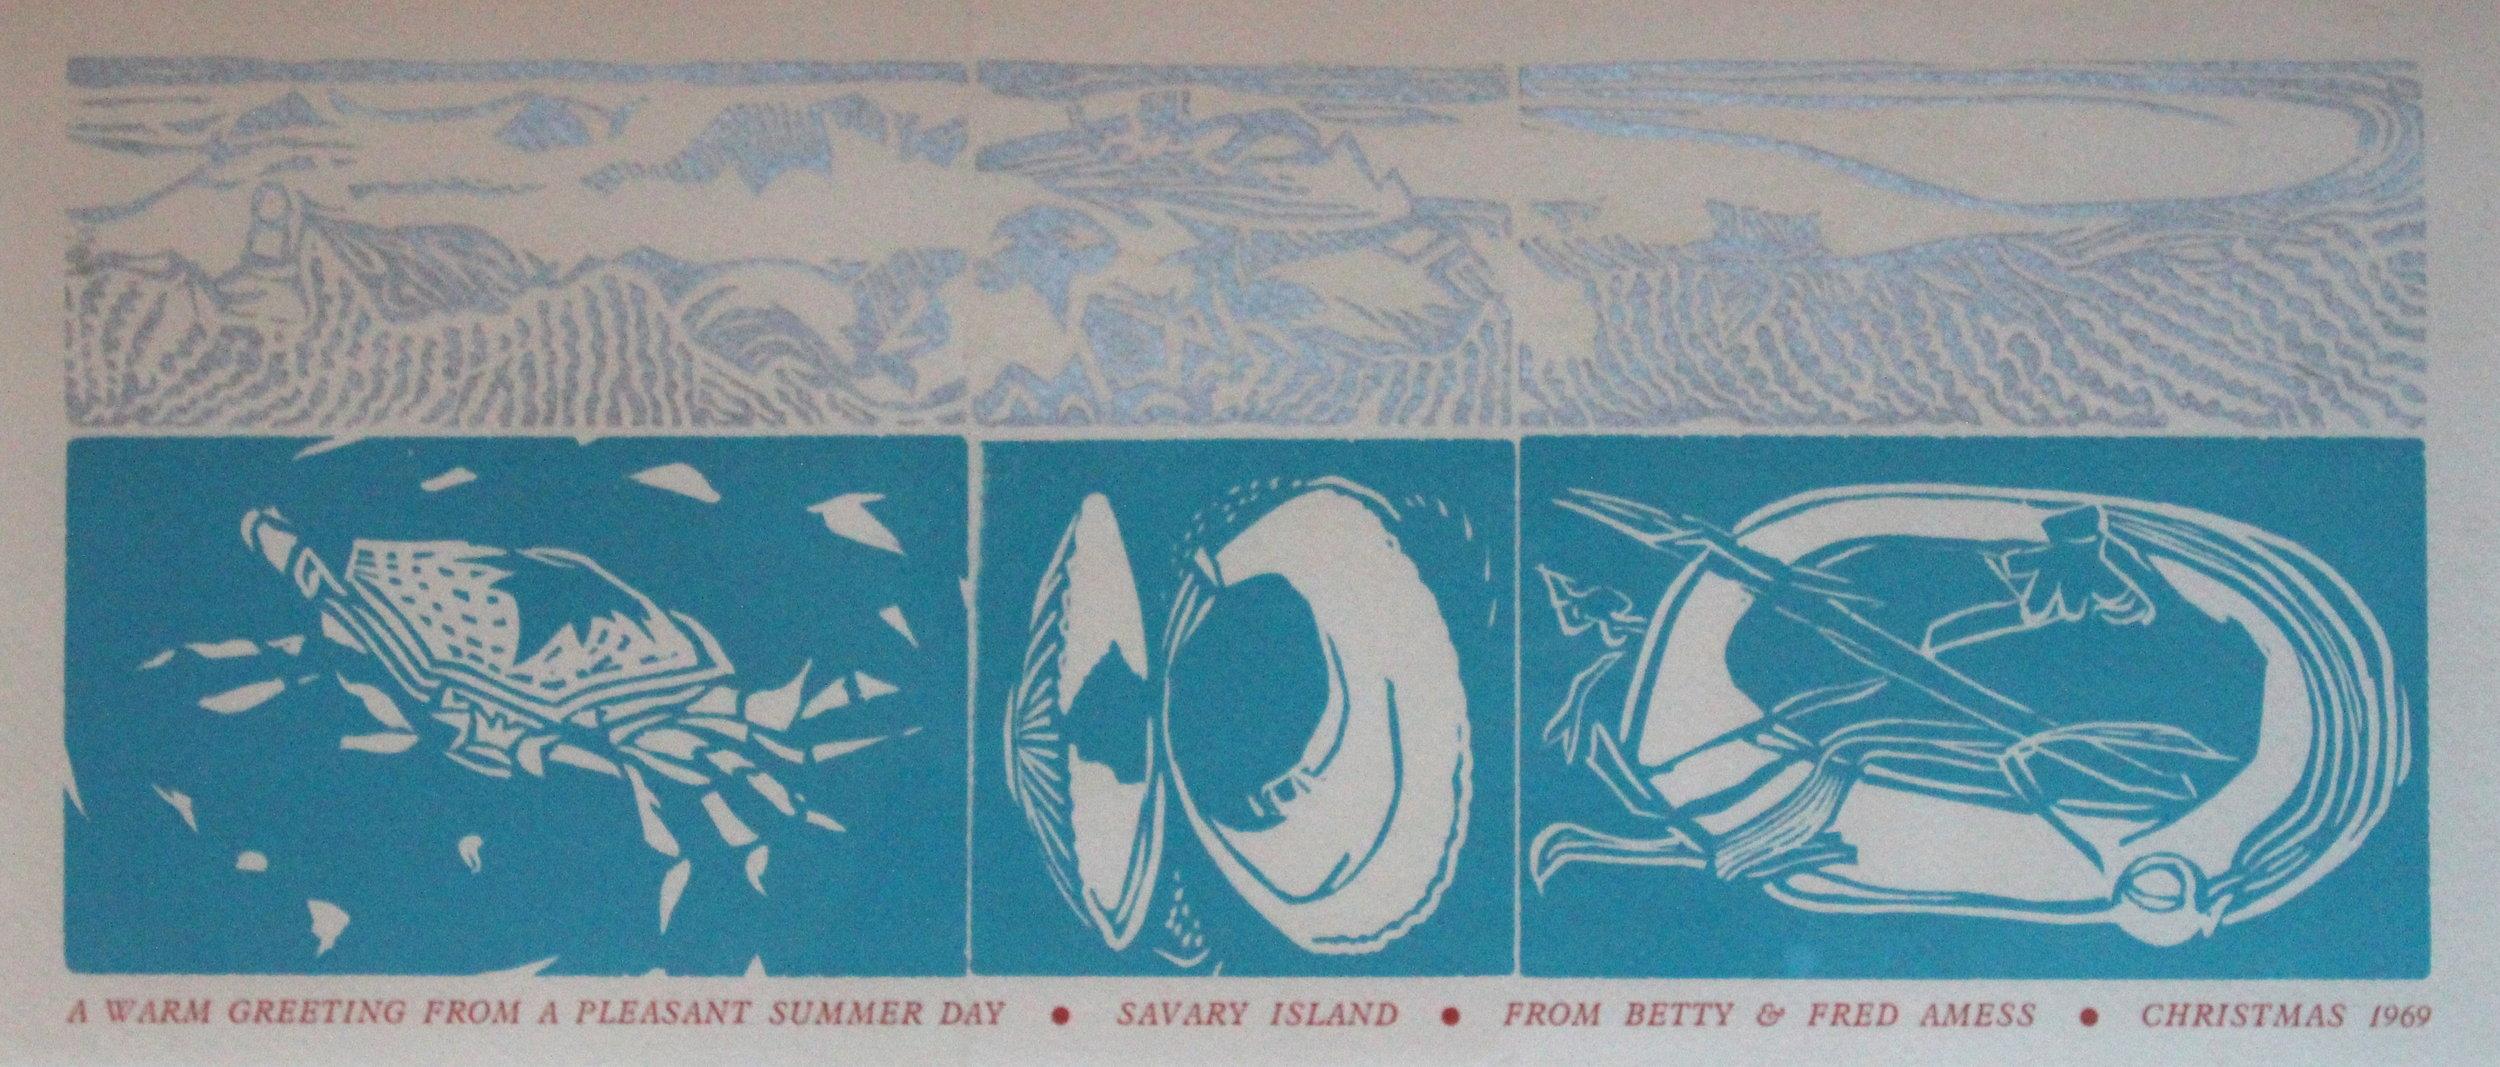 Fred Amess, Christmas Card, 1969